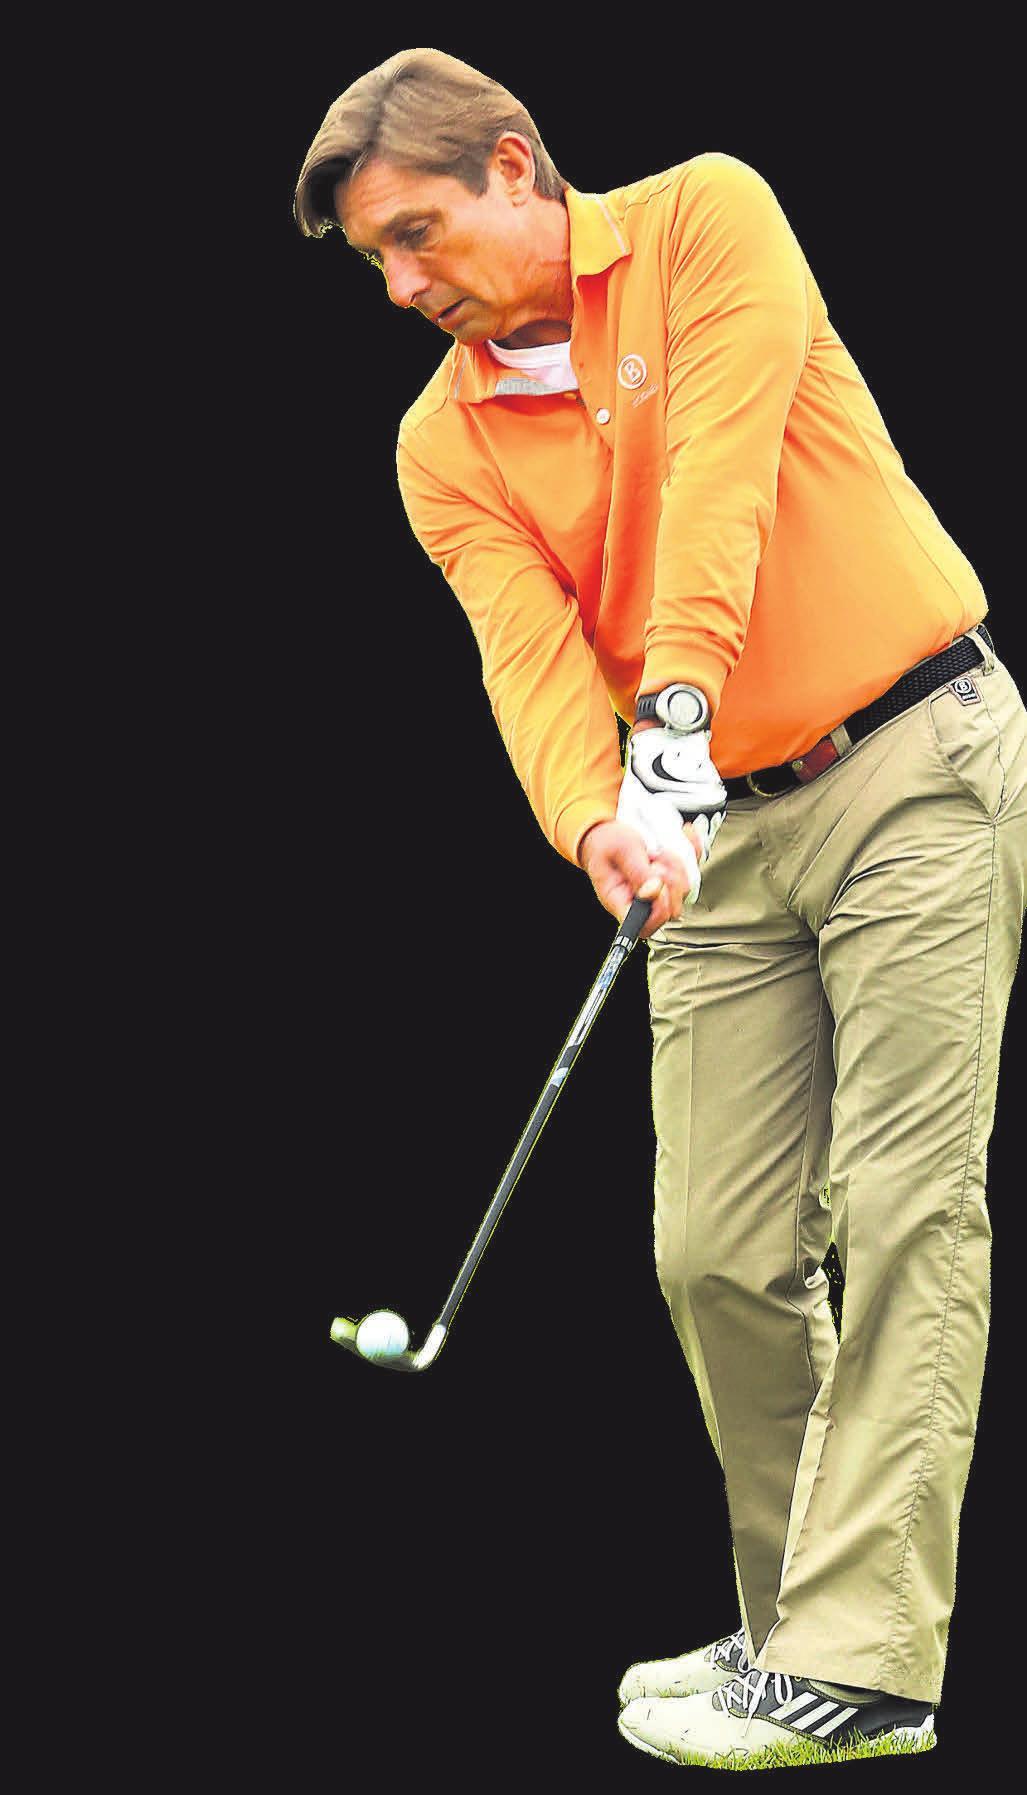 Golfverband-Chef Rüdiger Born beim Putten. Foto: Dietmar Lilienthal